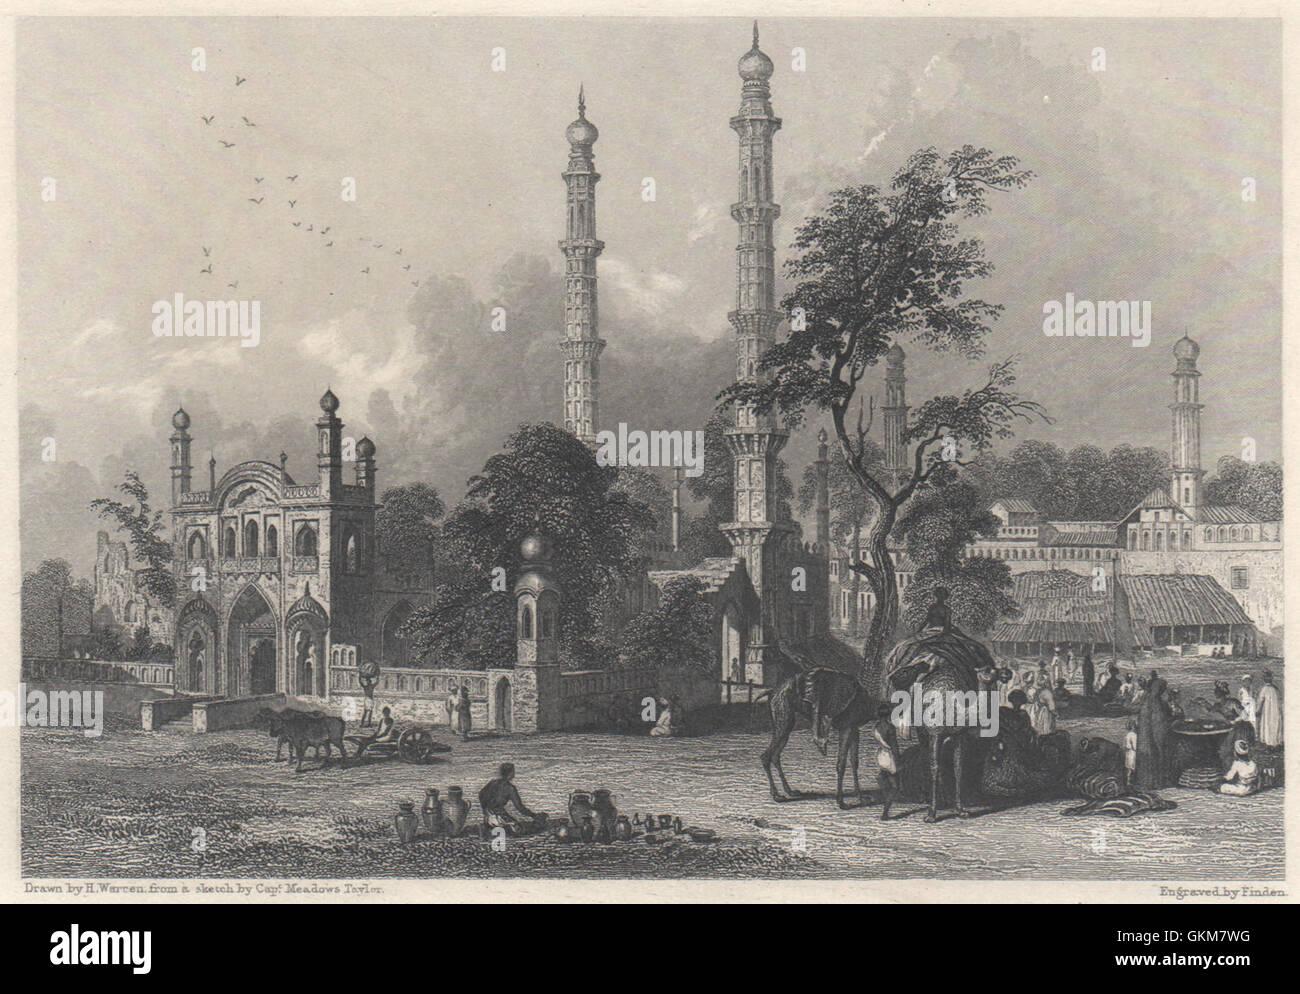 Mosque of Abdul Rahim Khan, Burhanpur, Hindustan, antique print 1840 - Stock Image